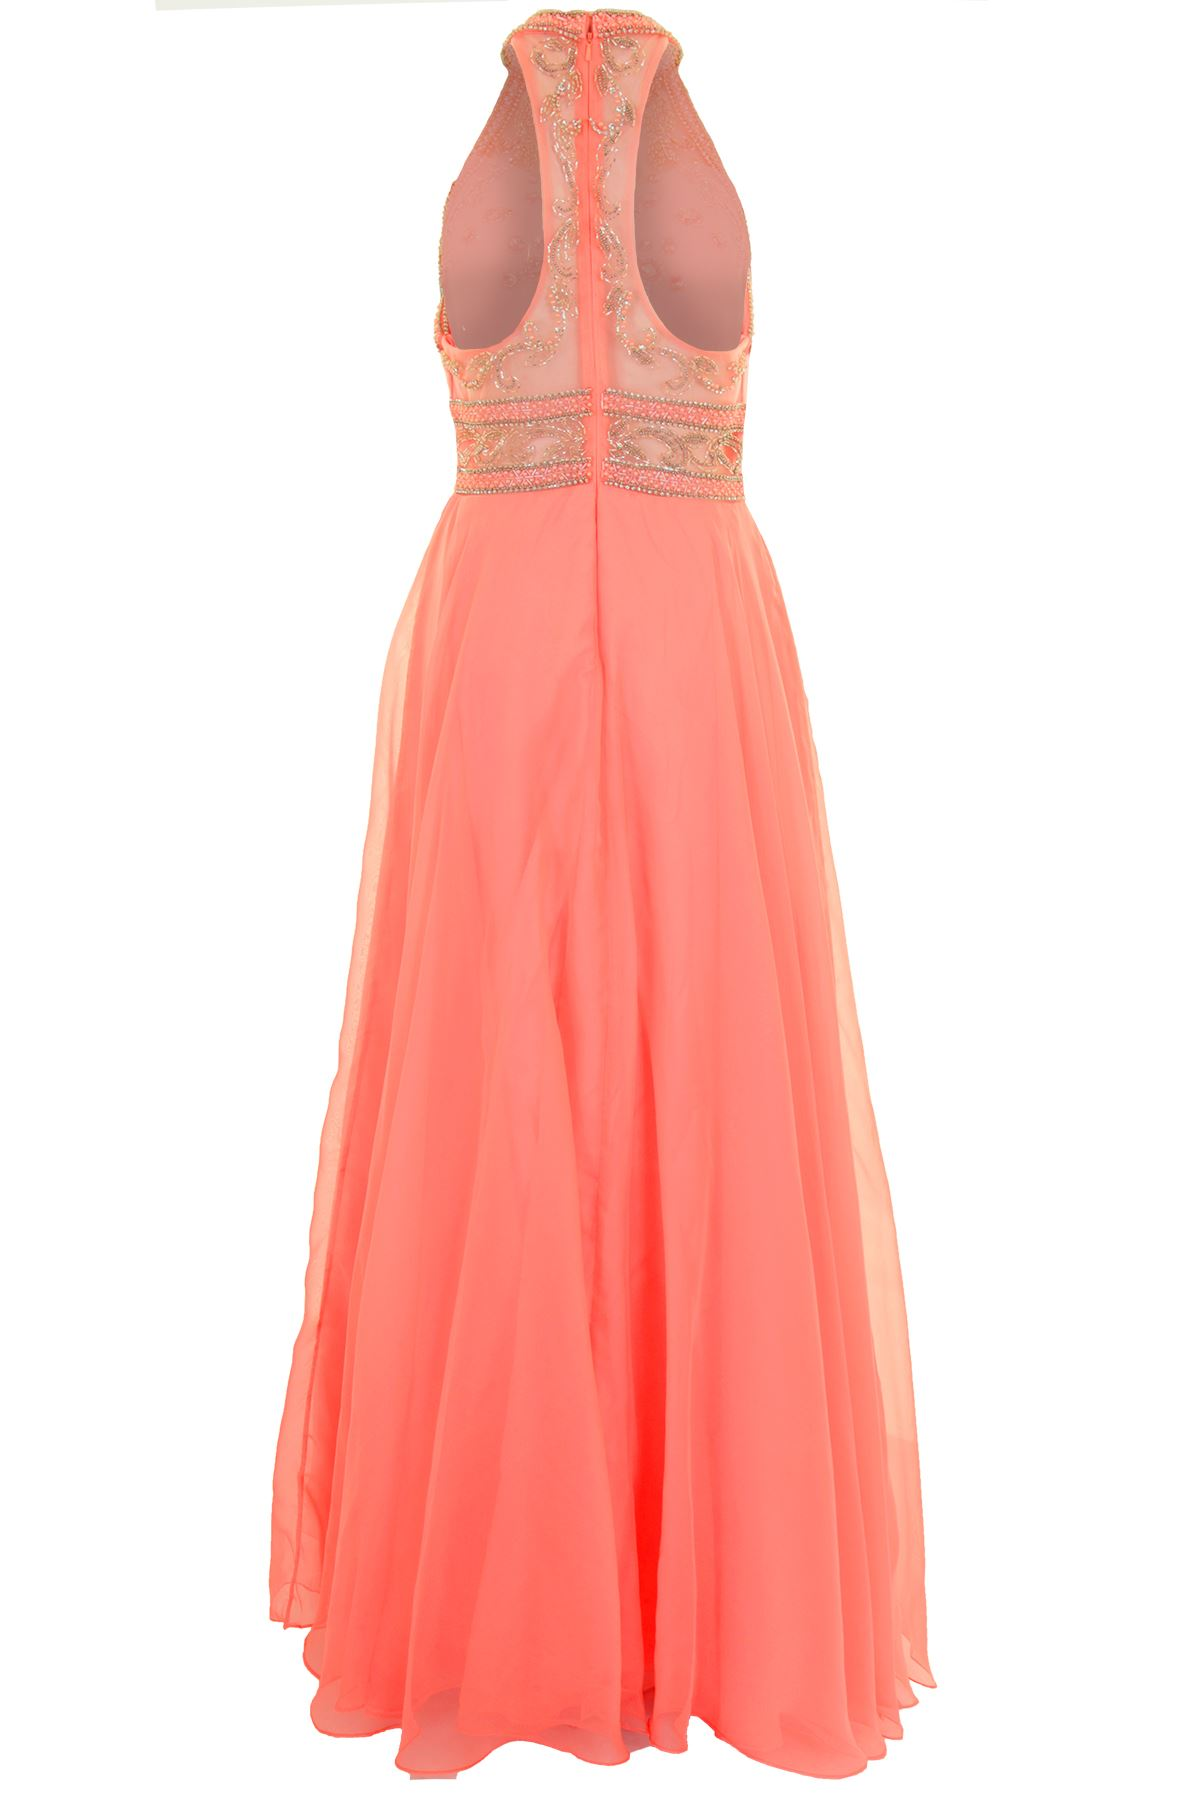 Long Sleeveless Chiffon Mesh Racer Back Maxi Party Prom Evening Gown Dress